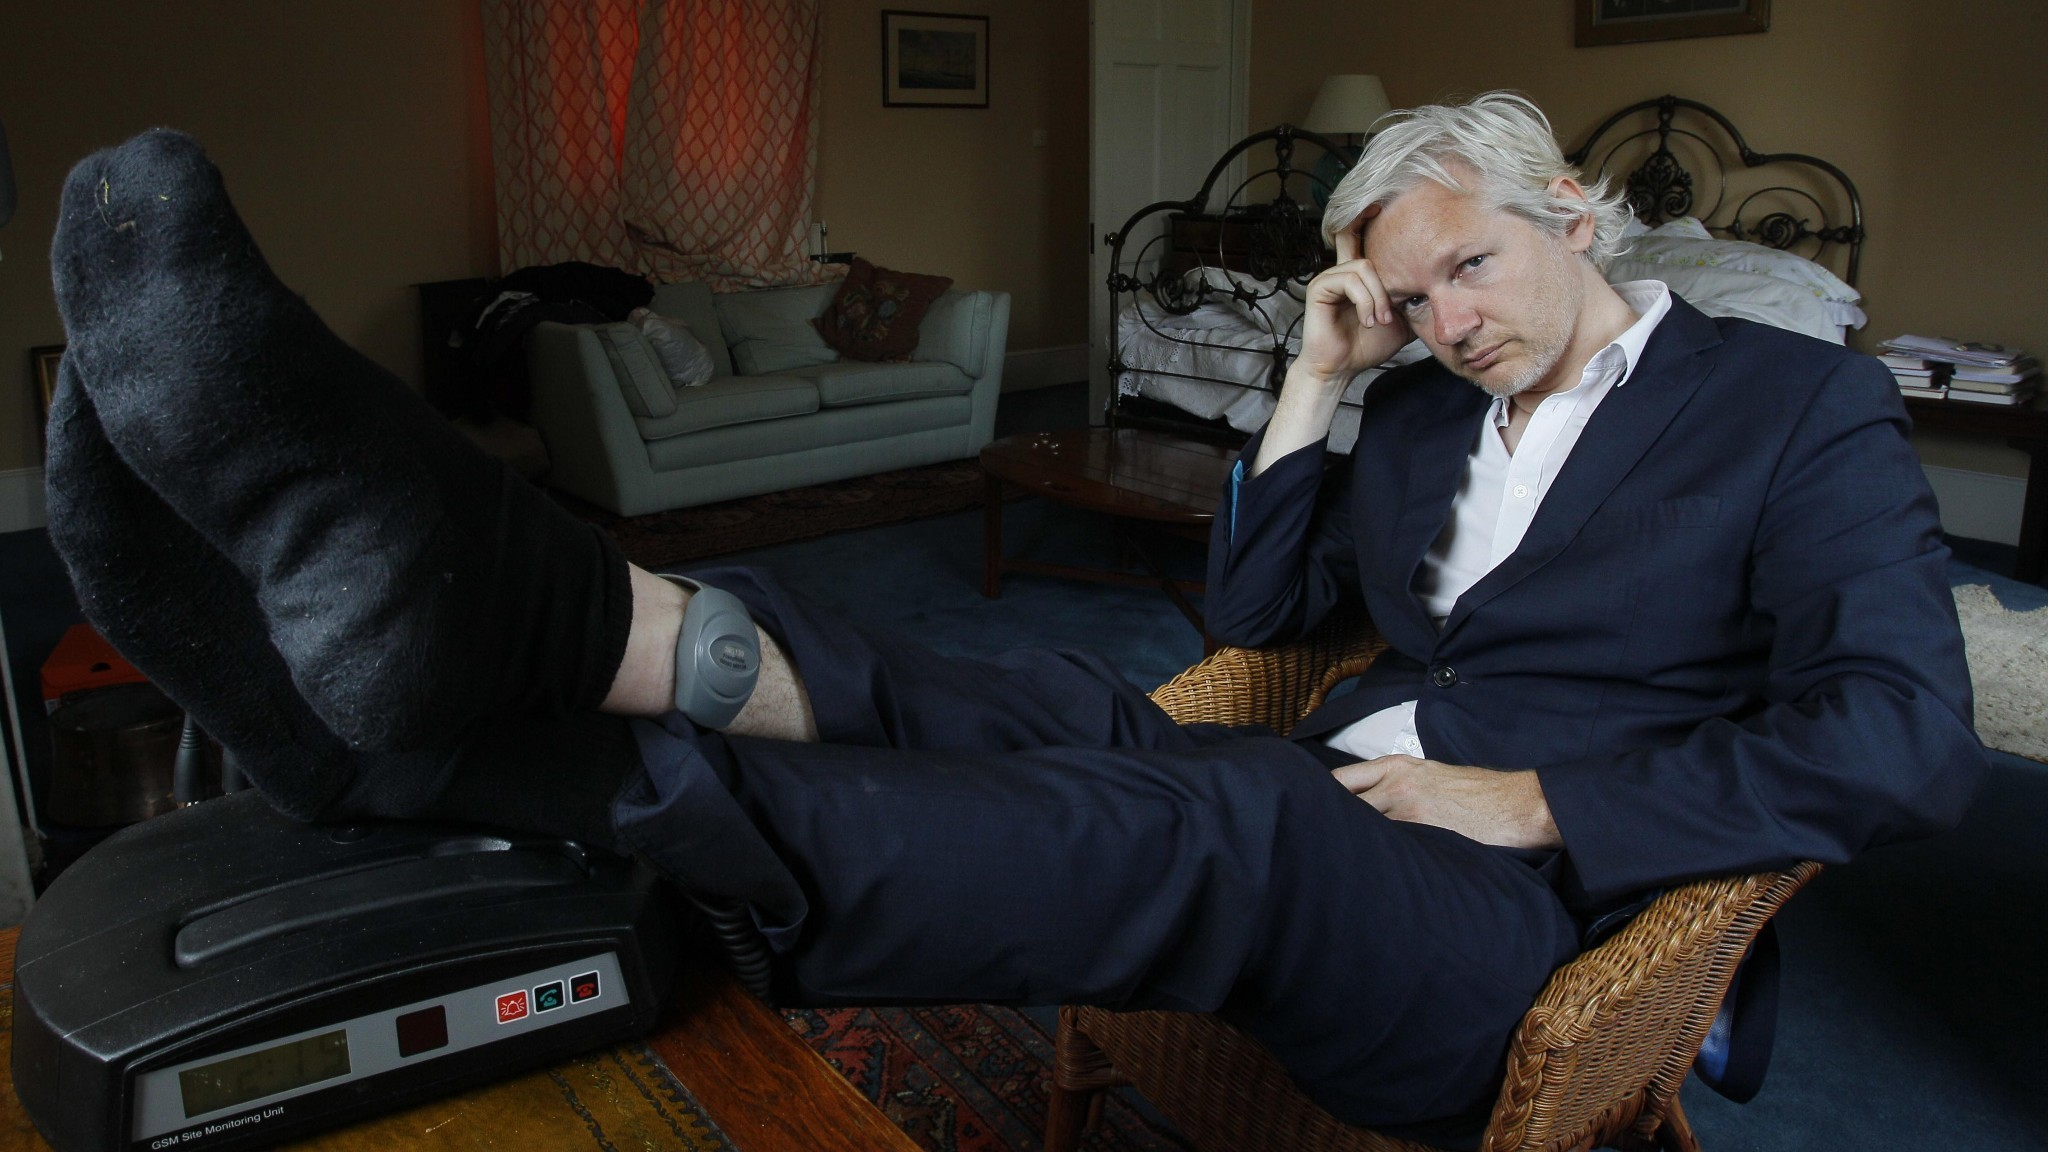 Swedish prosecutors drop Julian Assange rape investigation